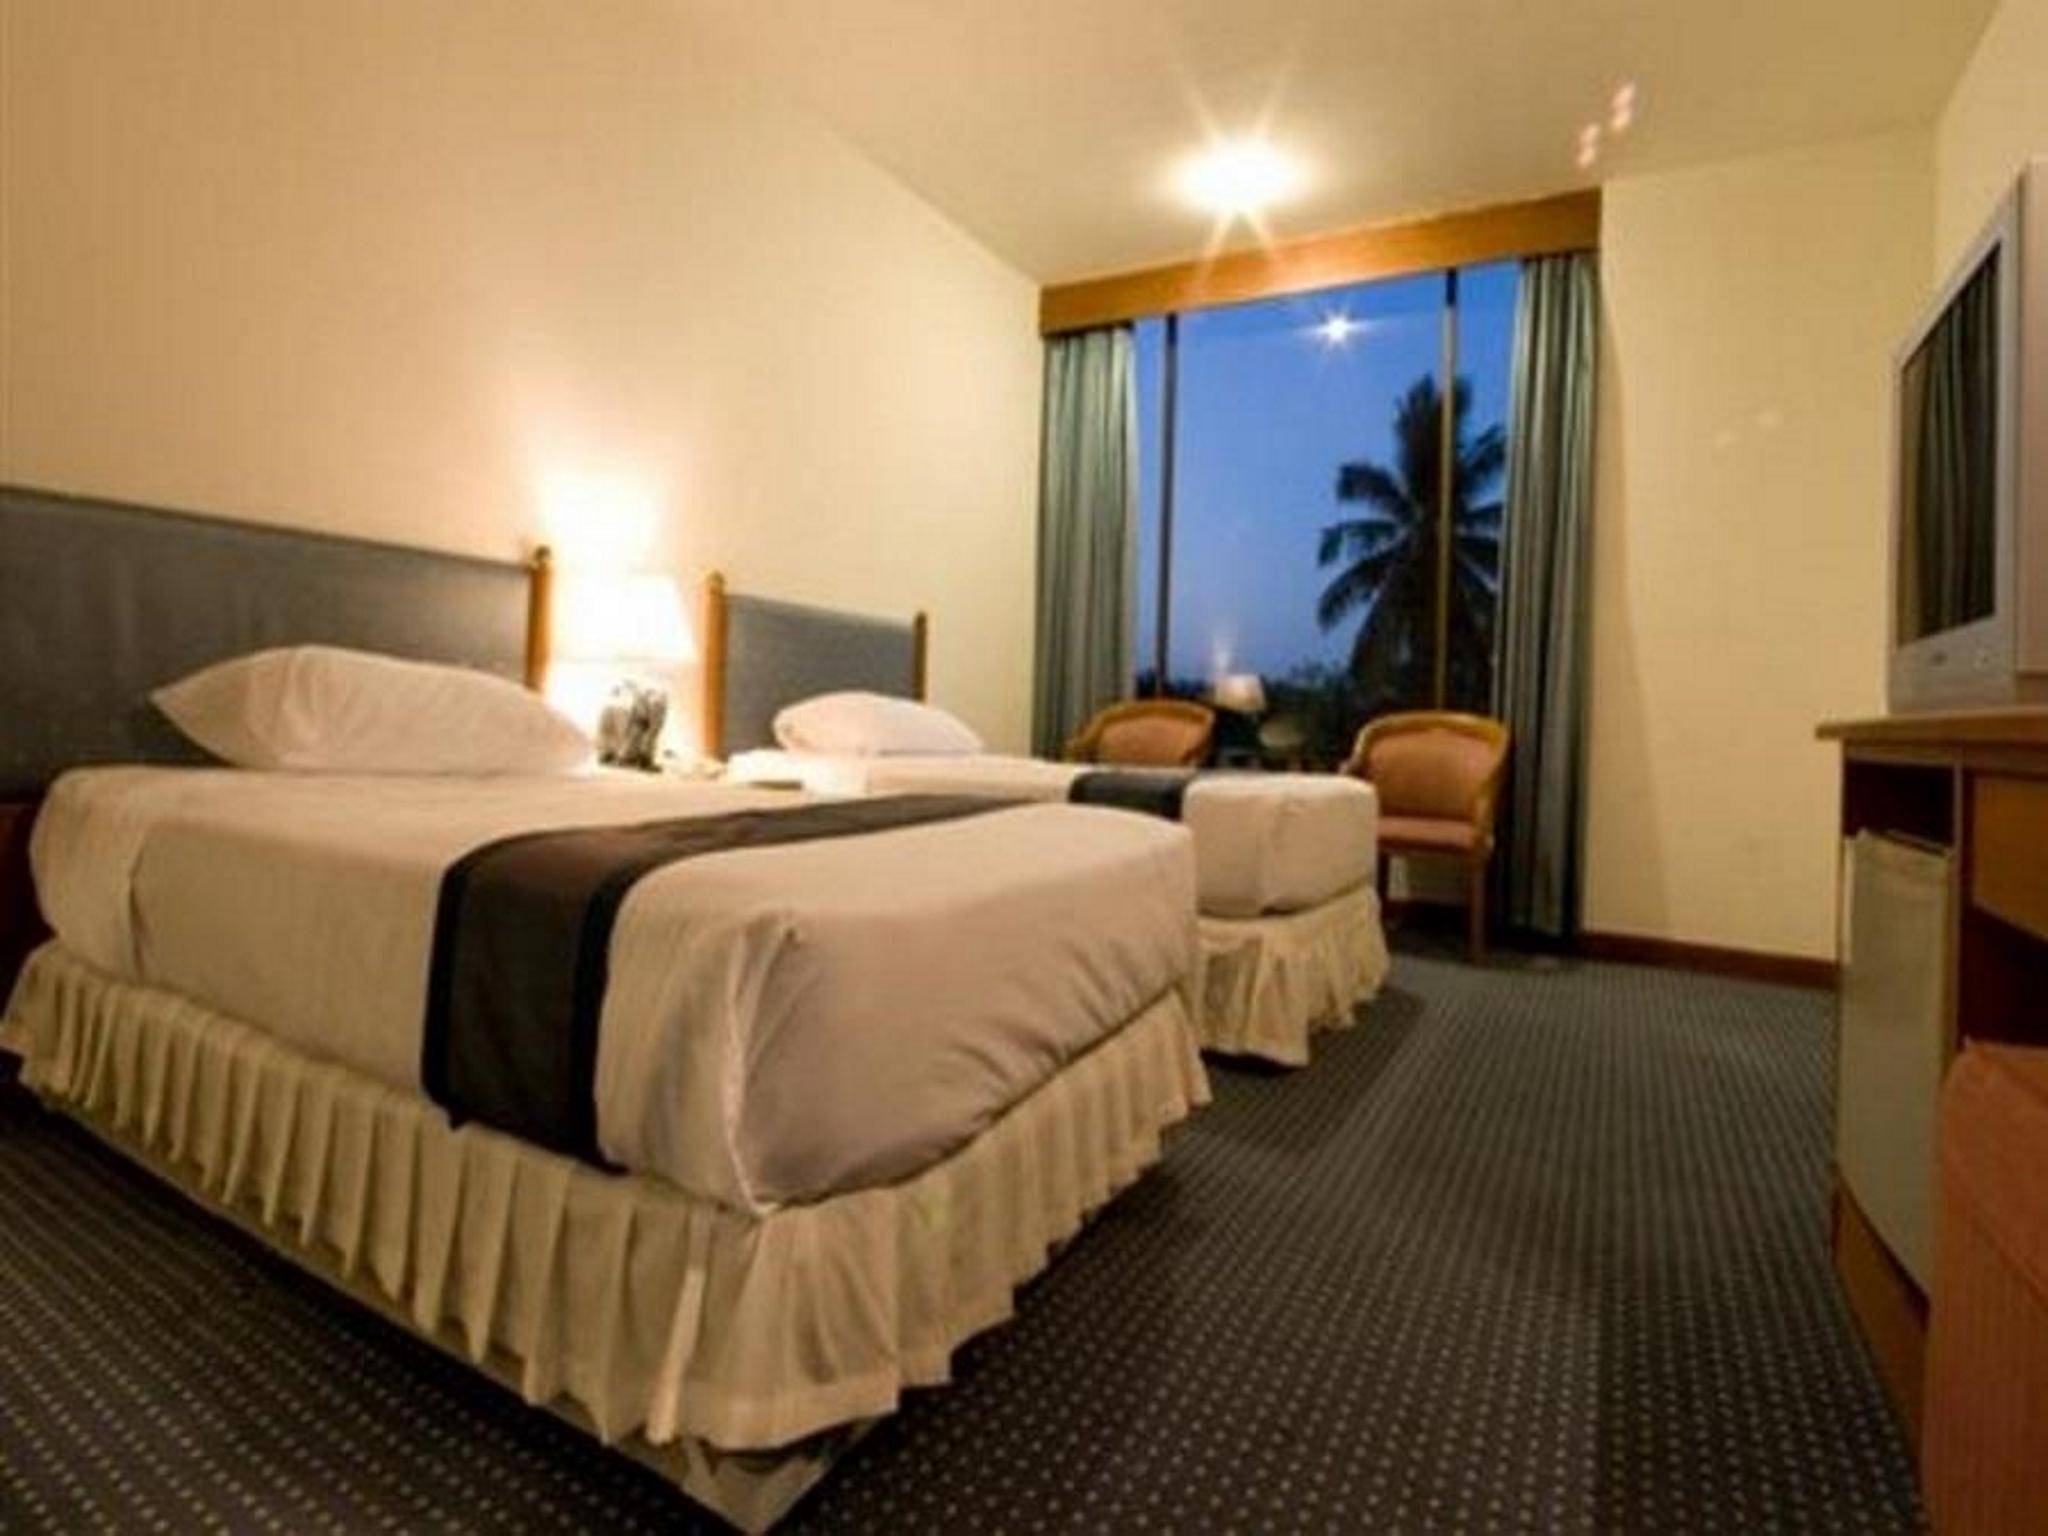 Tarin Hotel,โรงแรมธาริน